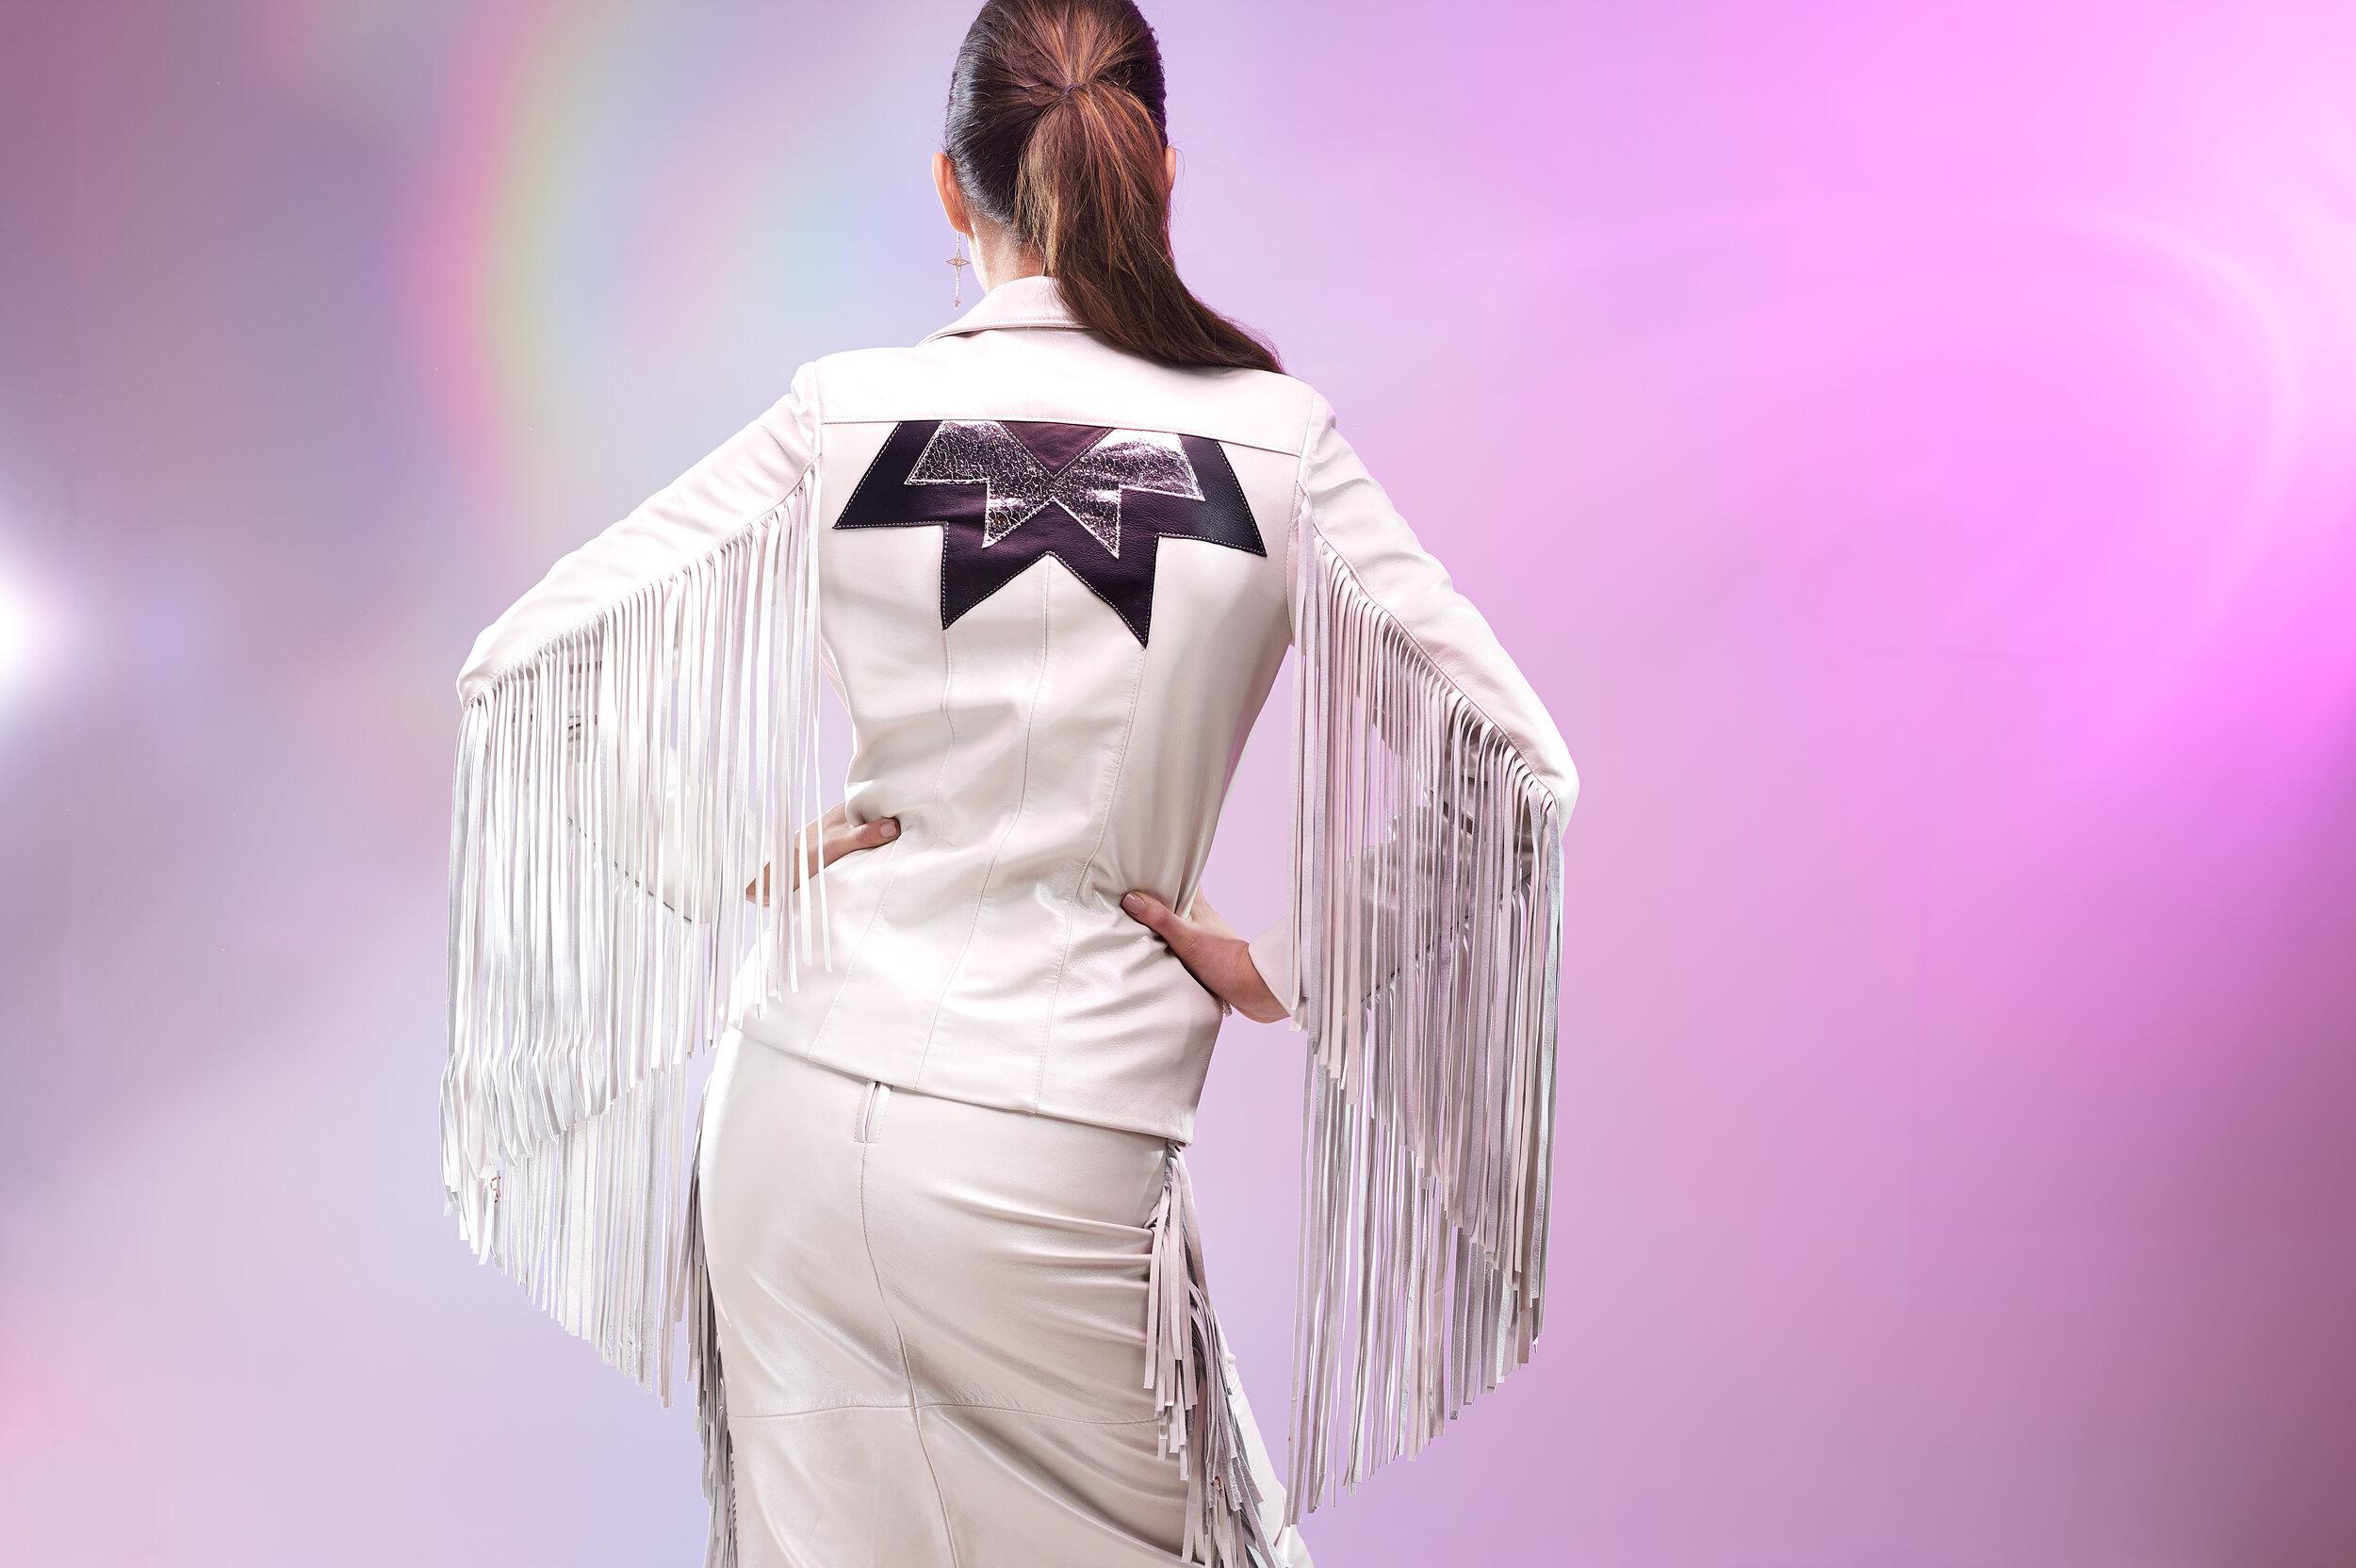 marta-hewson-angela-demontigny-lookbook-ss2019-36116.jpg